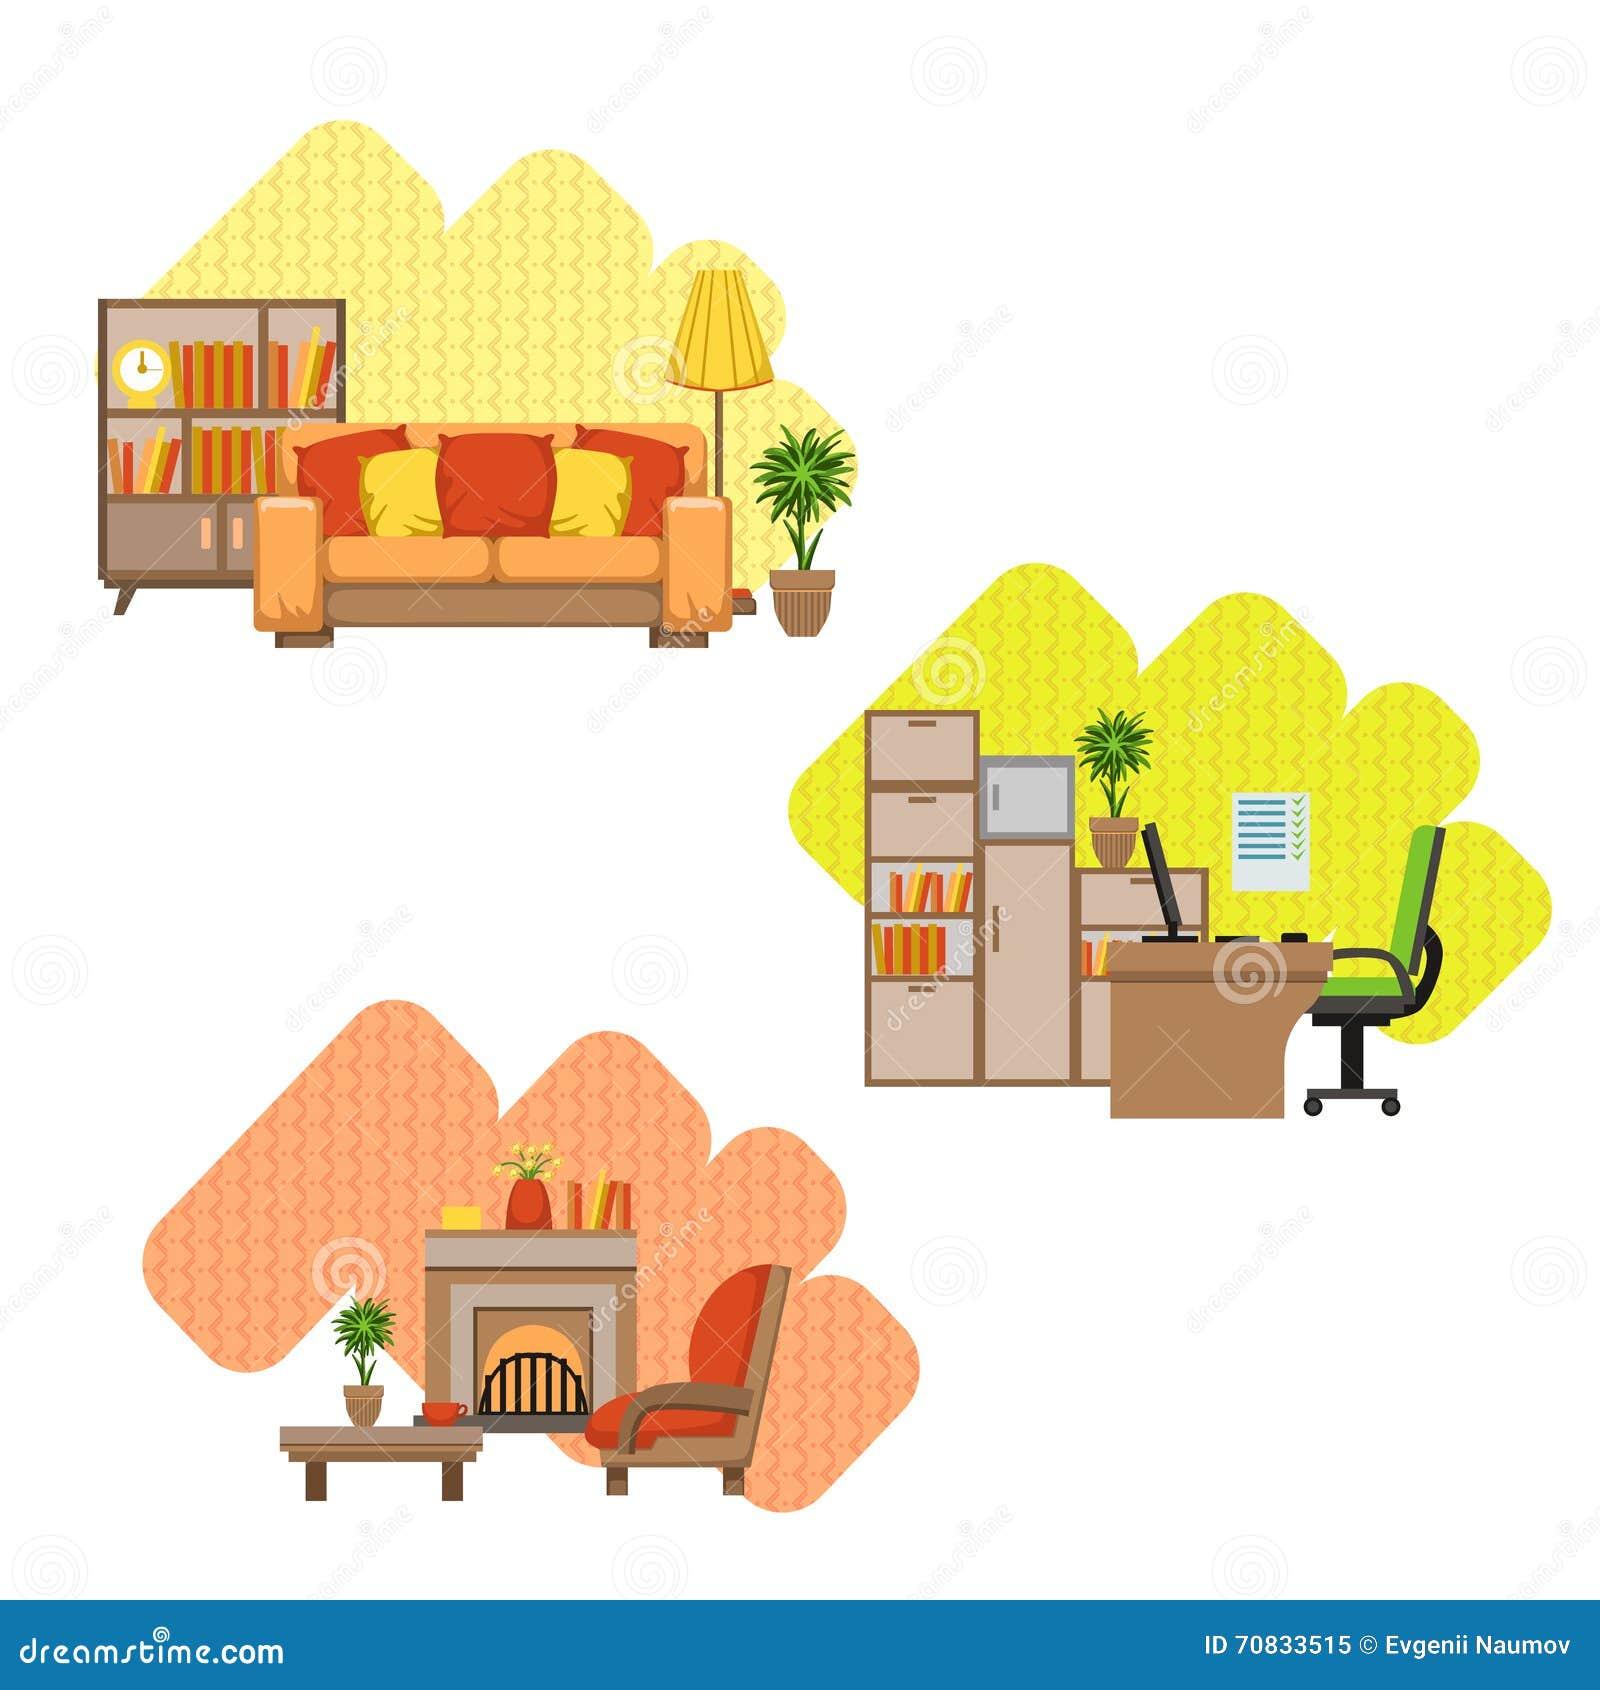 House design cartoon - Royalty Free Vector